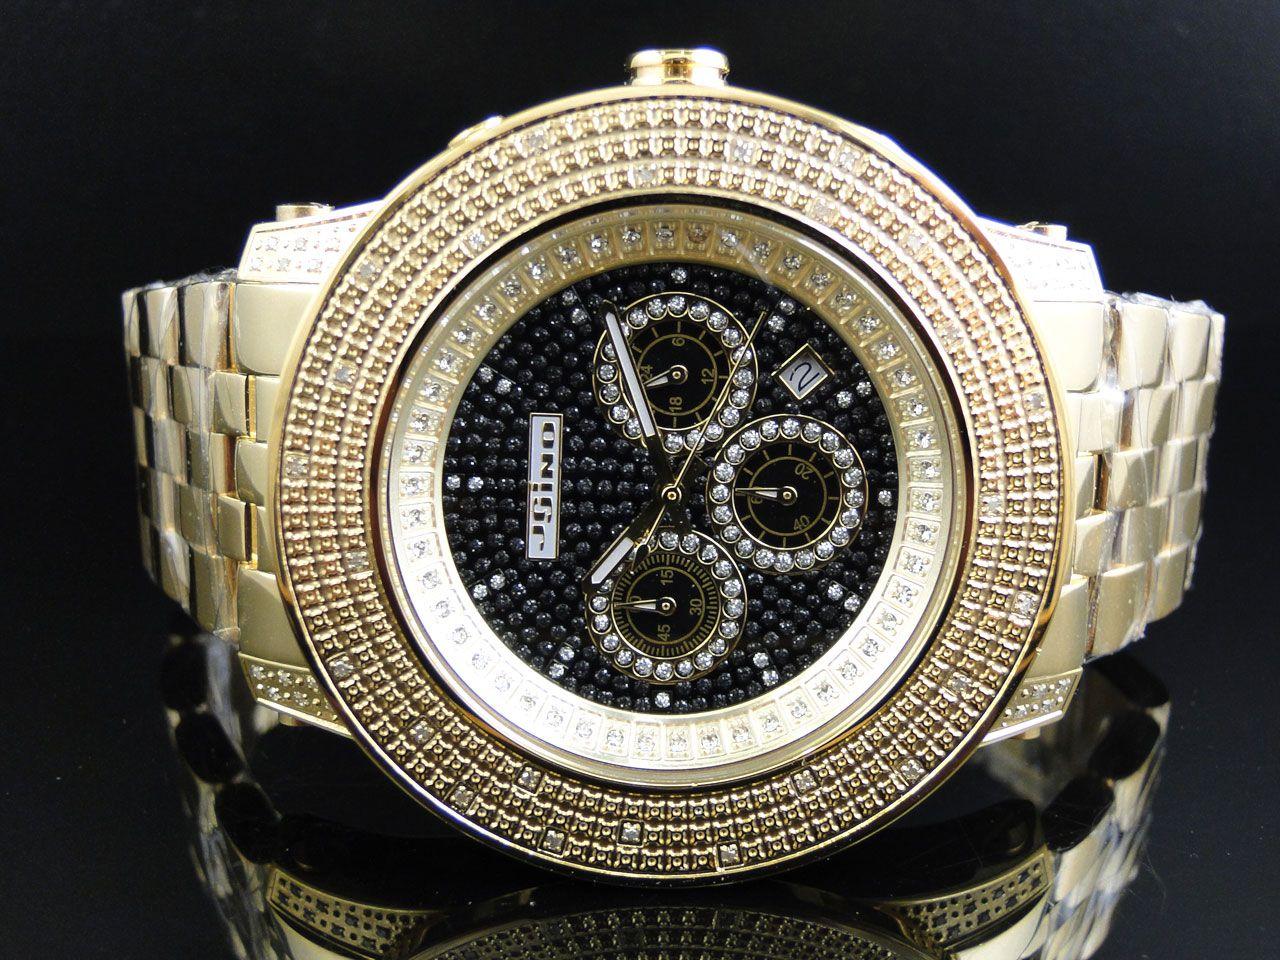 2019 year for women- Ladies Cartier precious diamond watches